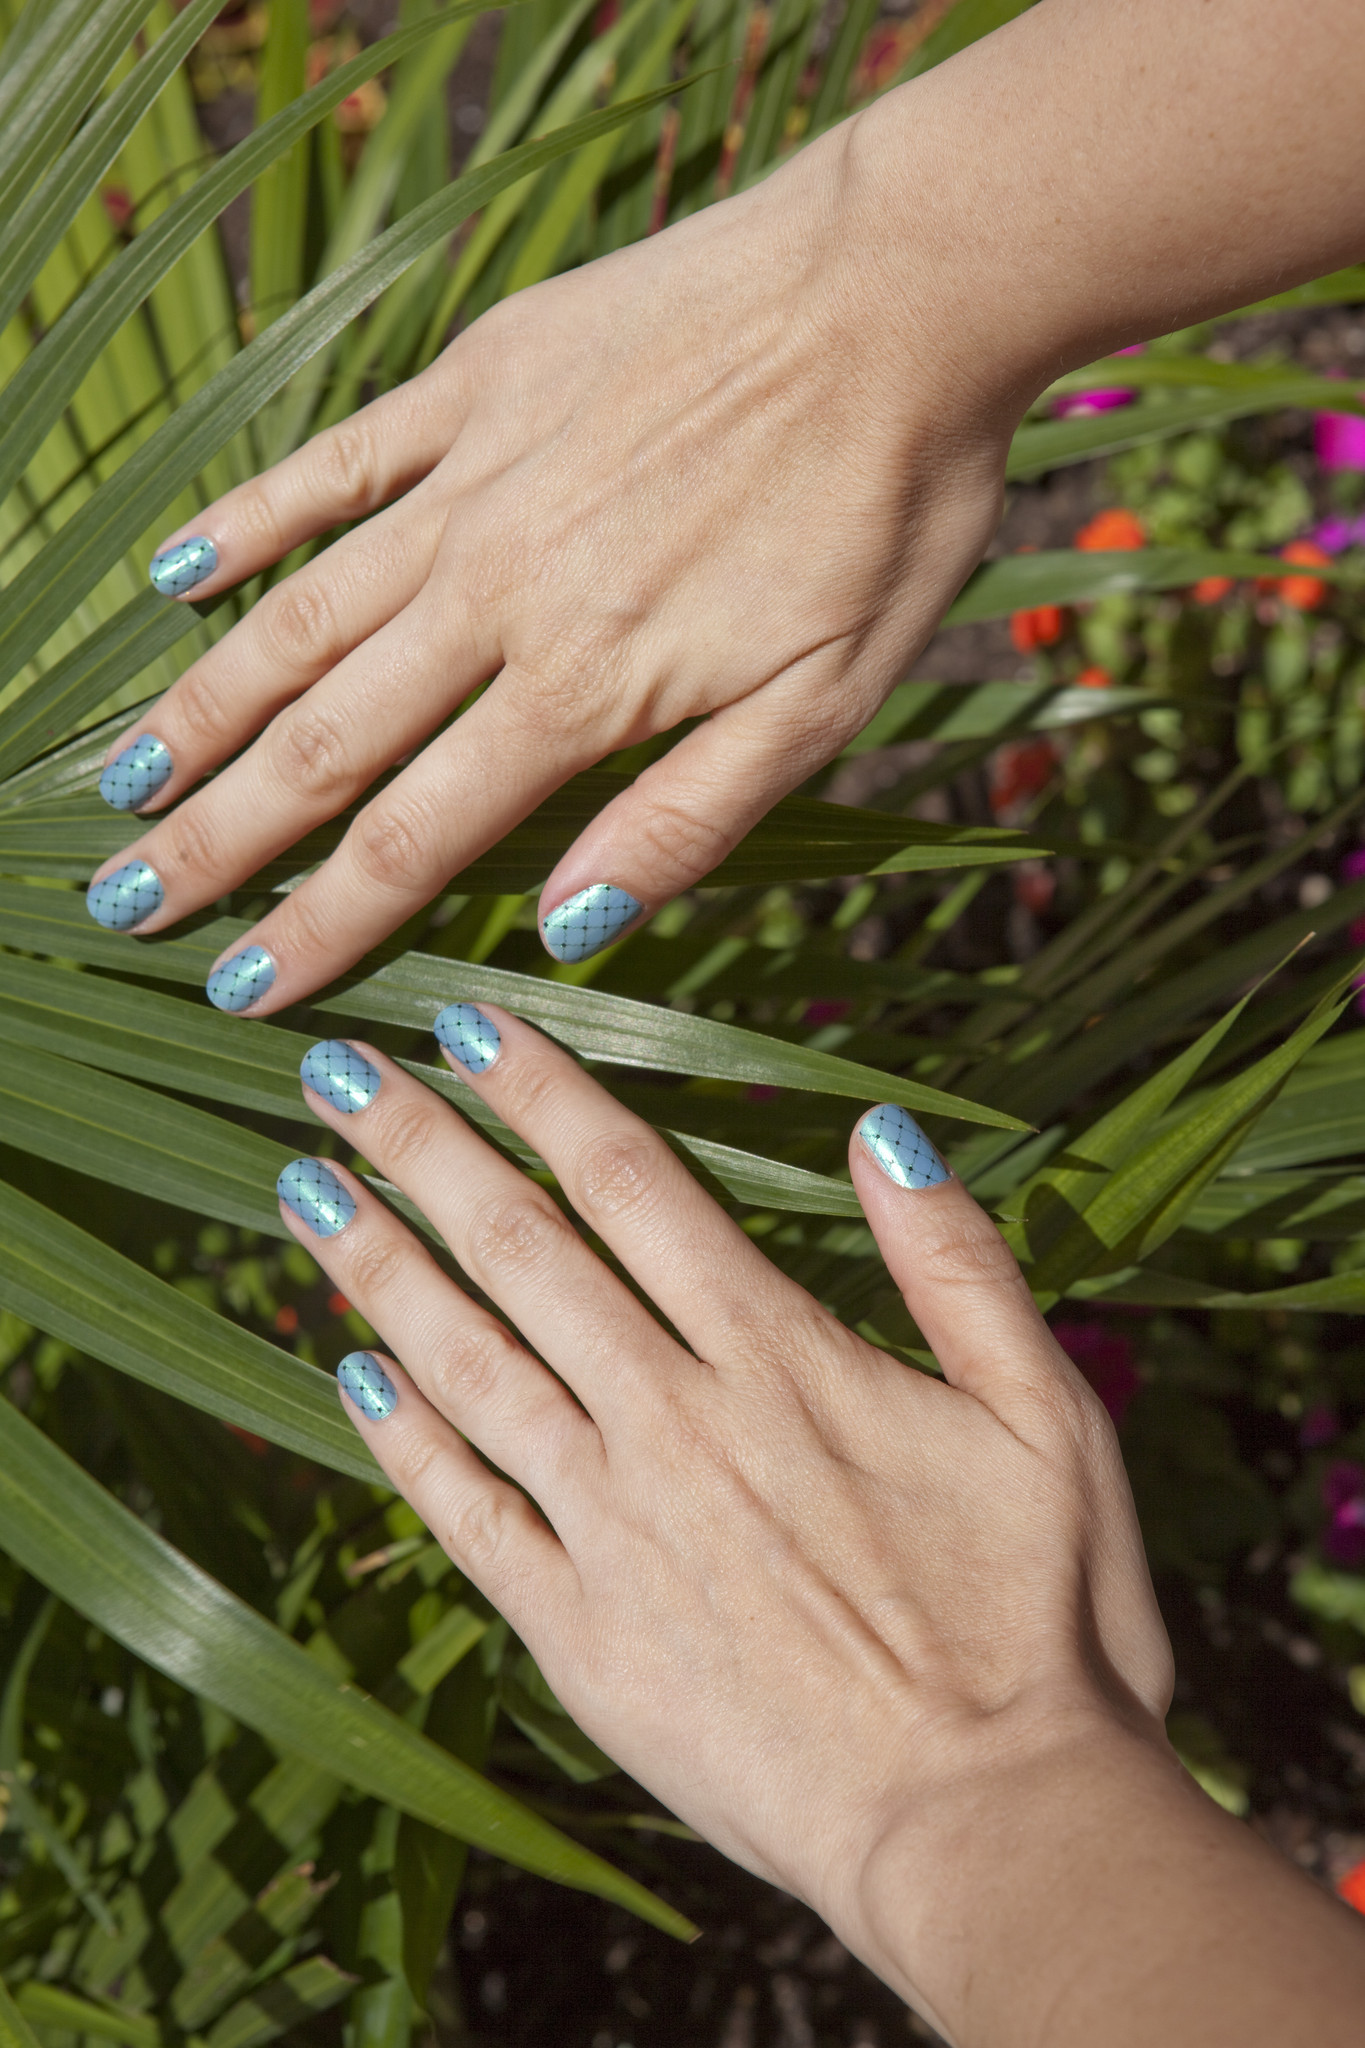 Polish strips make salon-style nails easy - RedEye Chicago